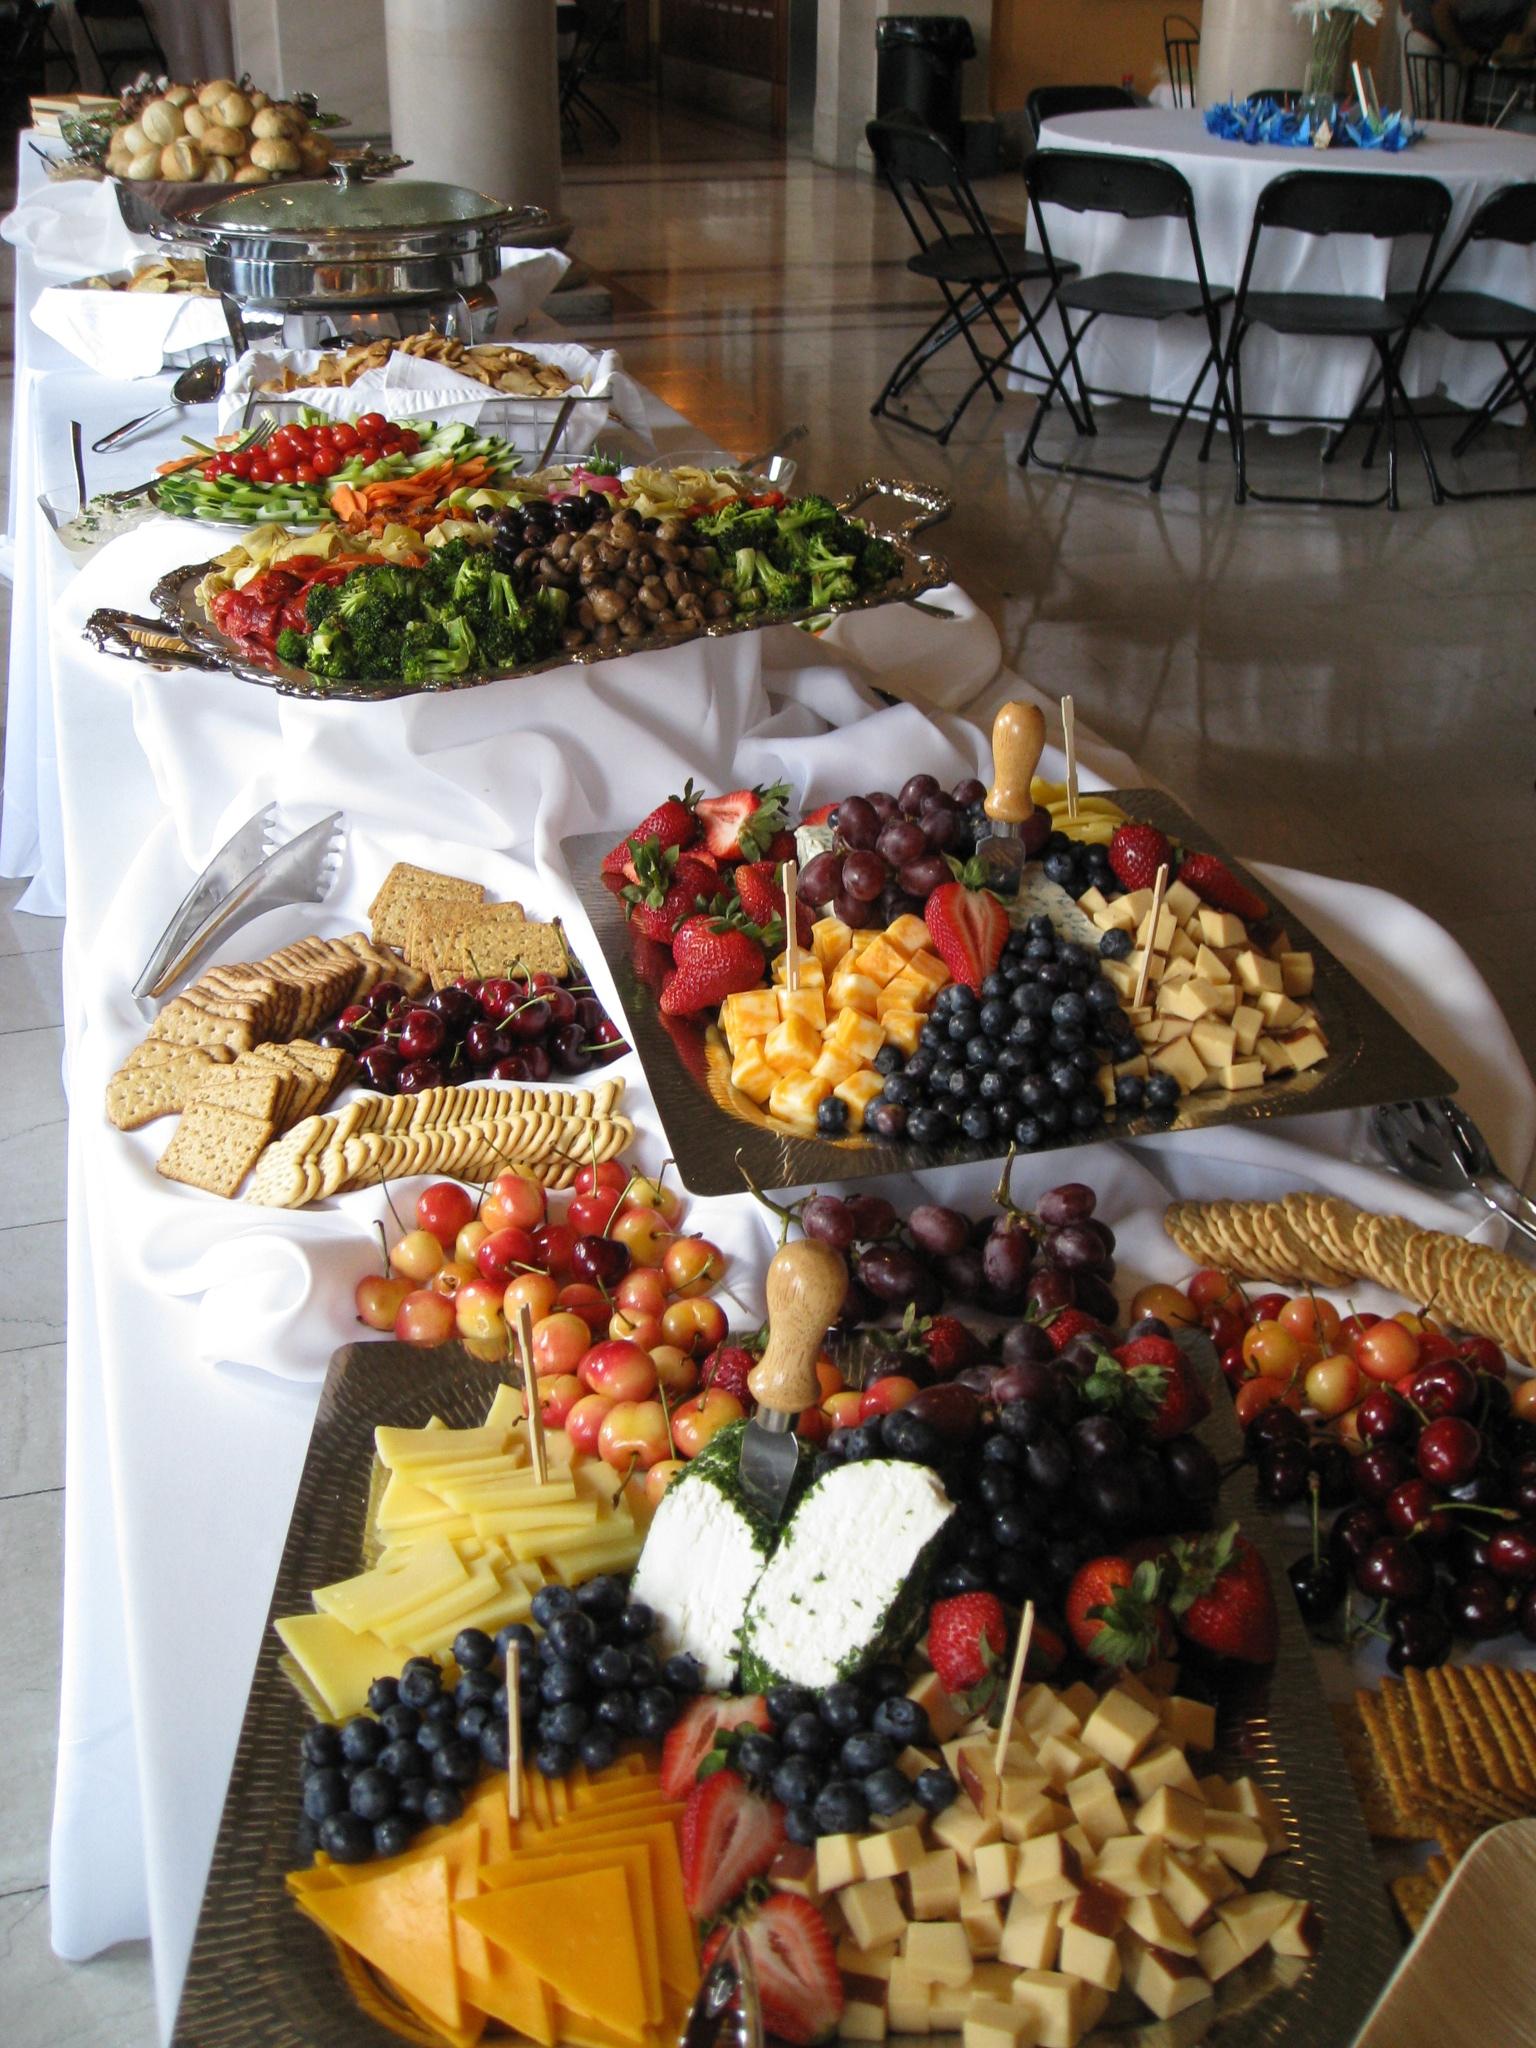 Everyday gourmet food platters on table